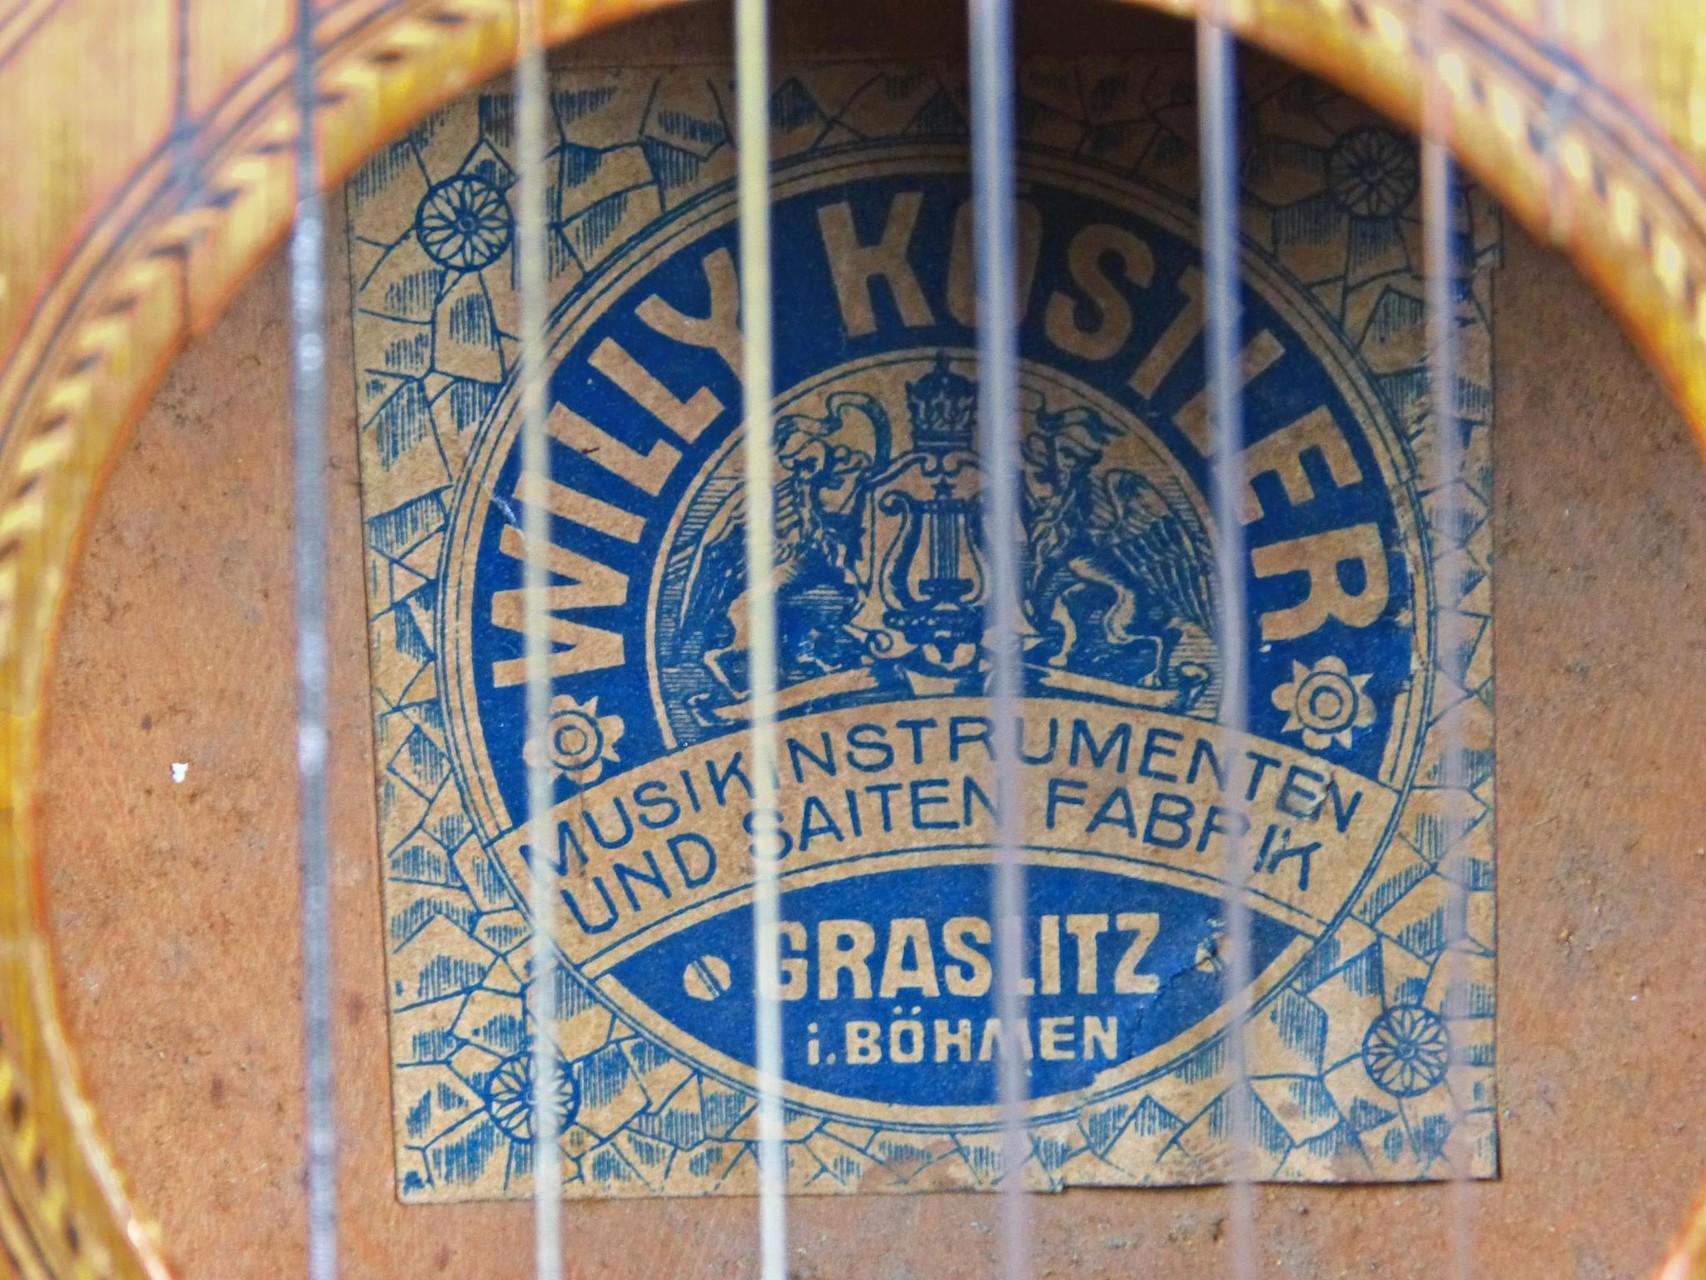 1915 1925 Guitarra Willy Kostler